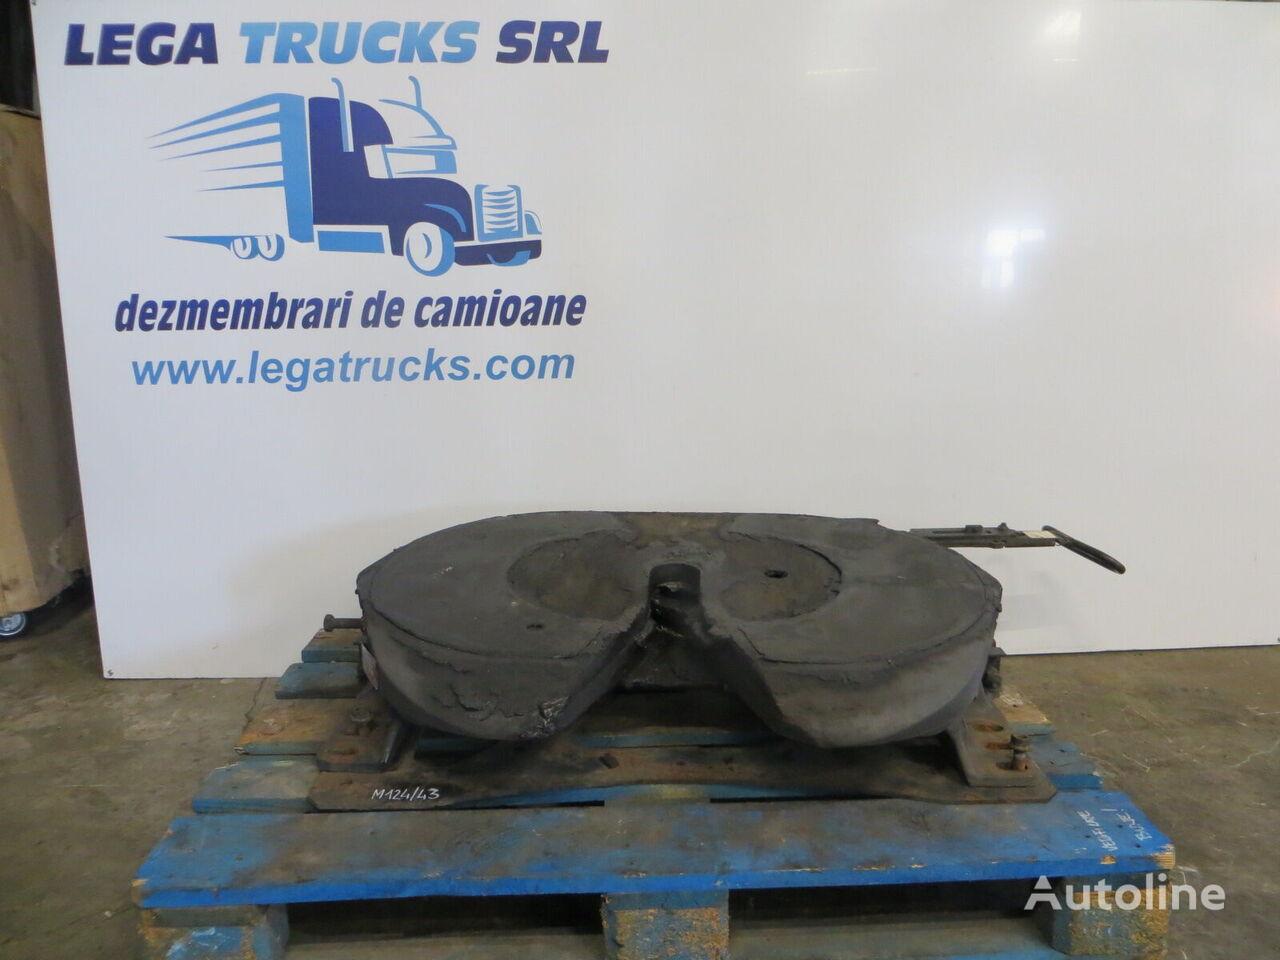 MAN (M124/43) quinta rueda para MAN TGA 430, euro 4 tractora